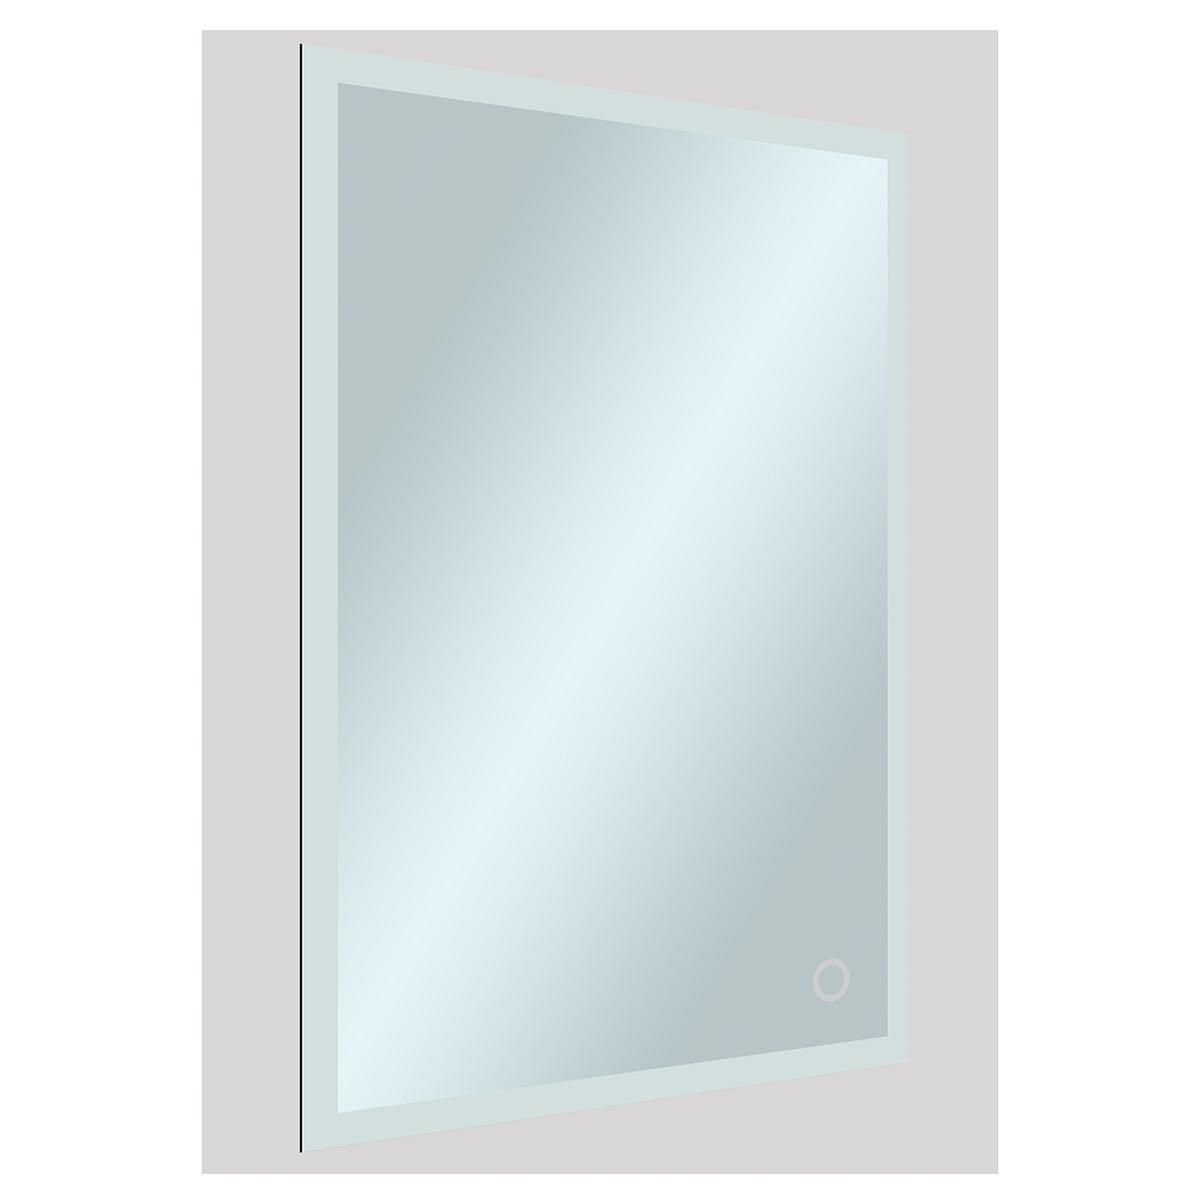 Espejo Luminar Con Luz Led Para Baño